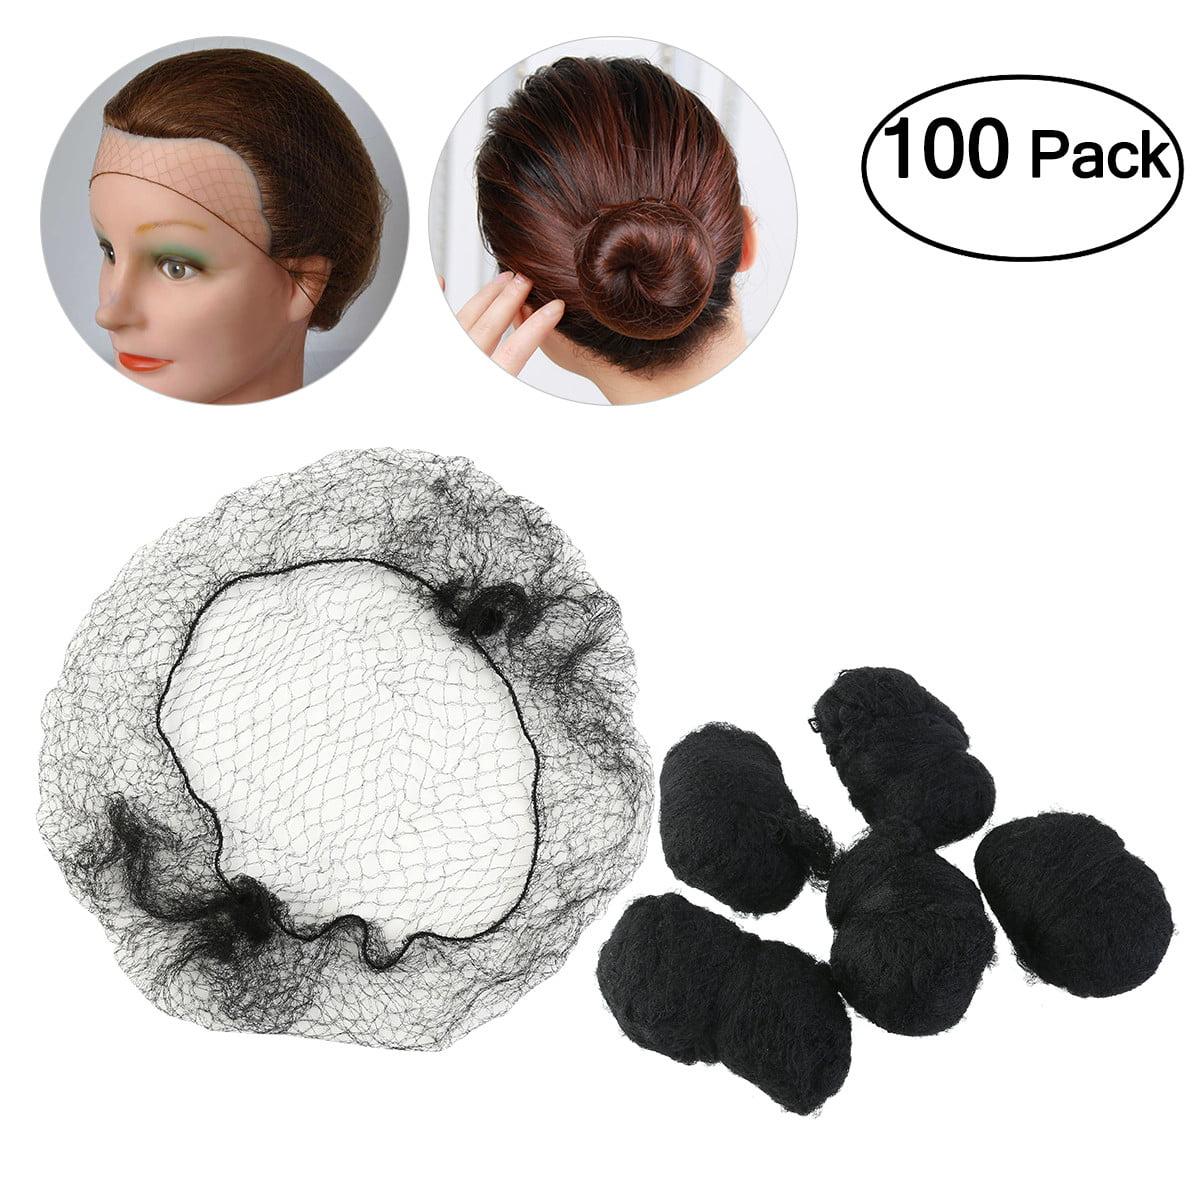 TINKSKY 100pcs Hair Nets Invisible Elastic Edge Mesh (Black)